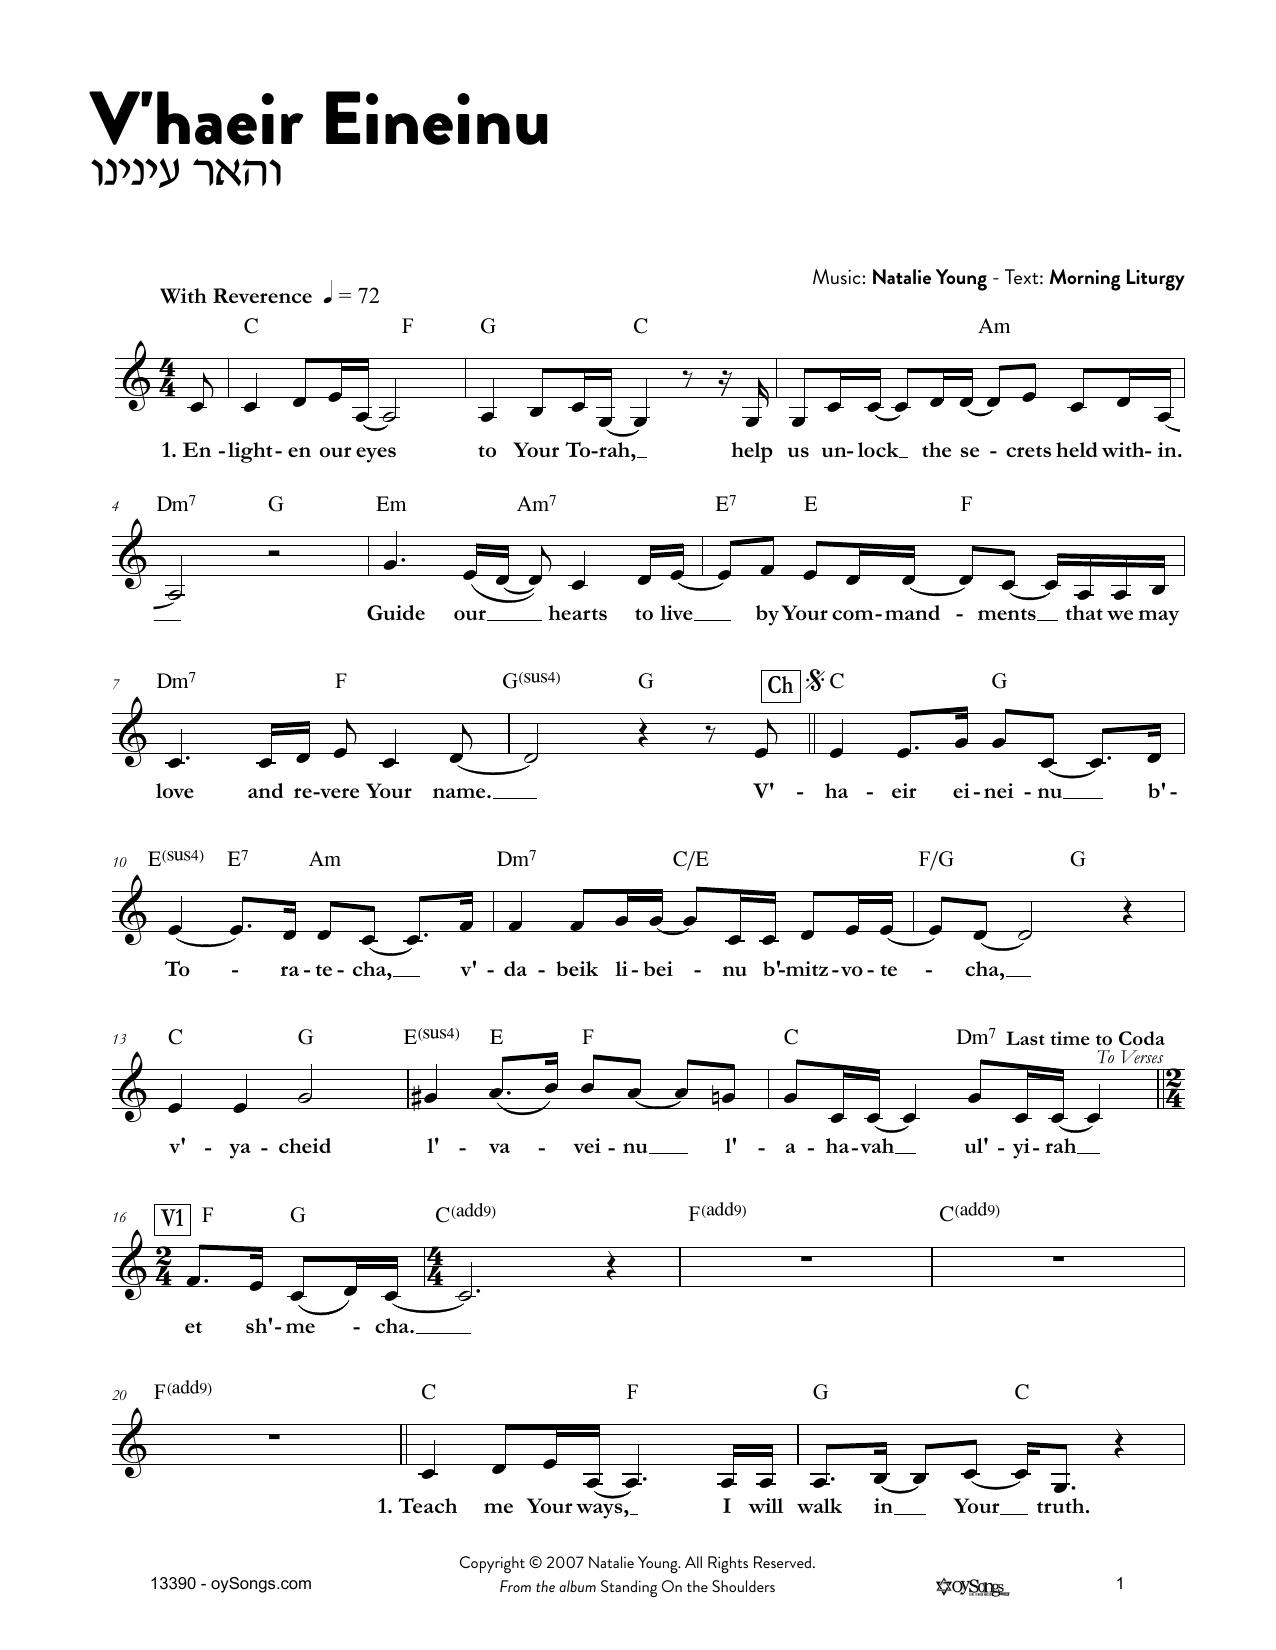 V'haeir Eineinu Sheet Music